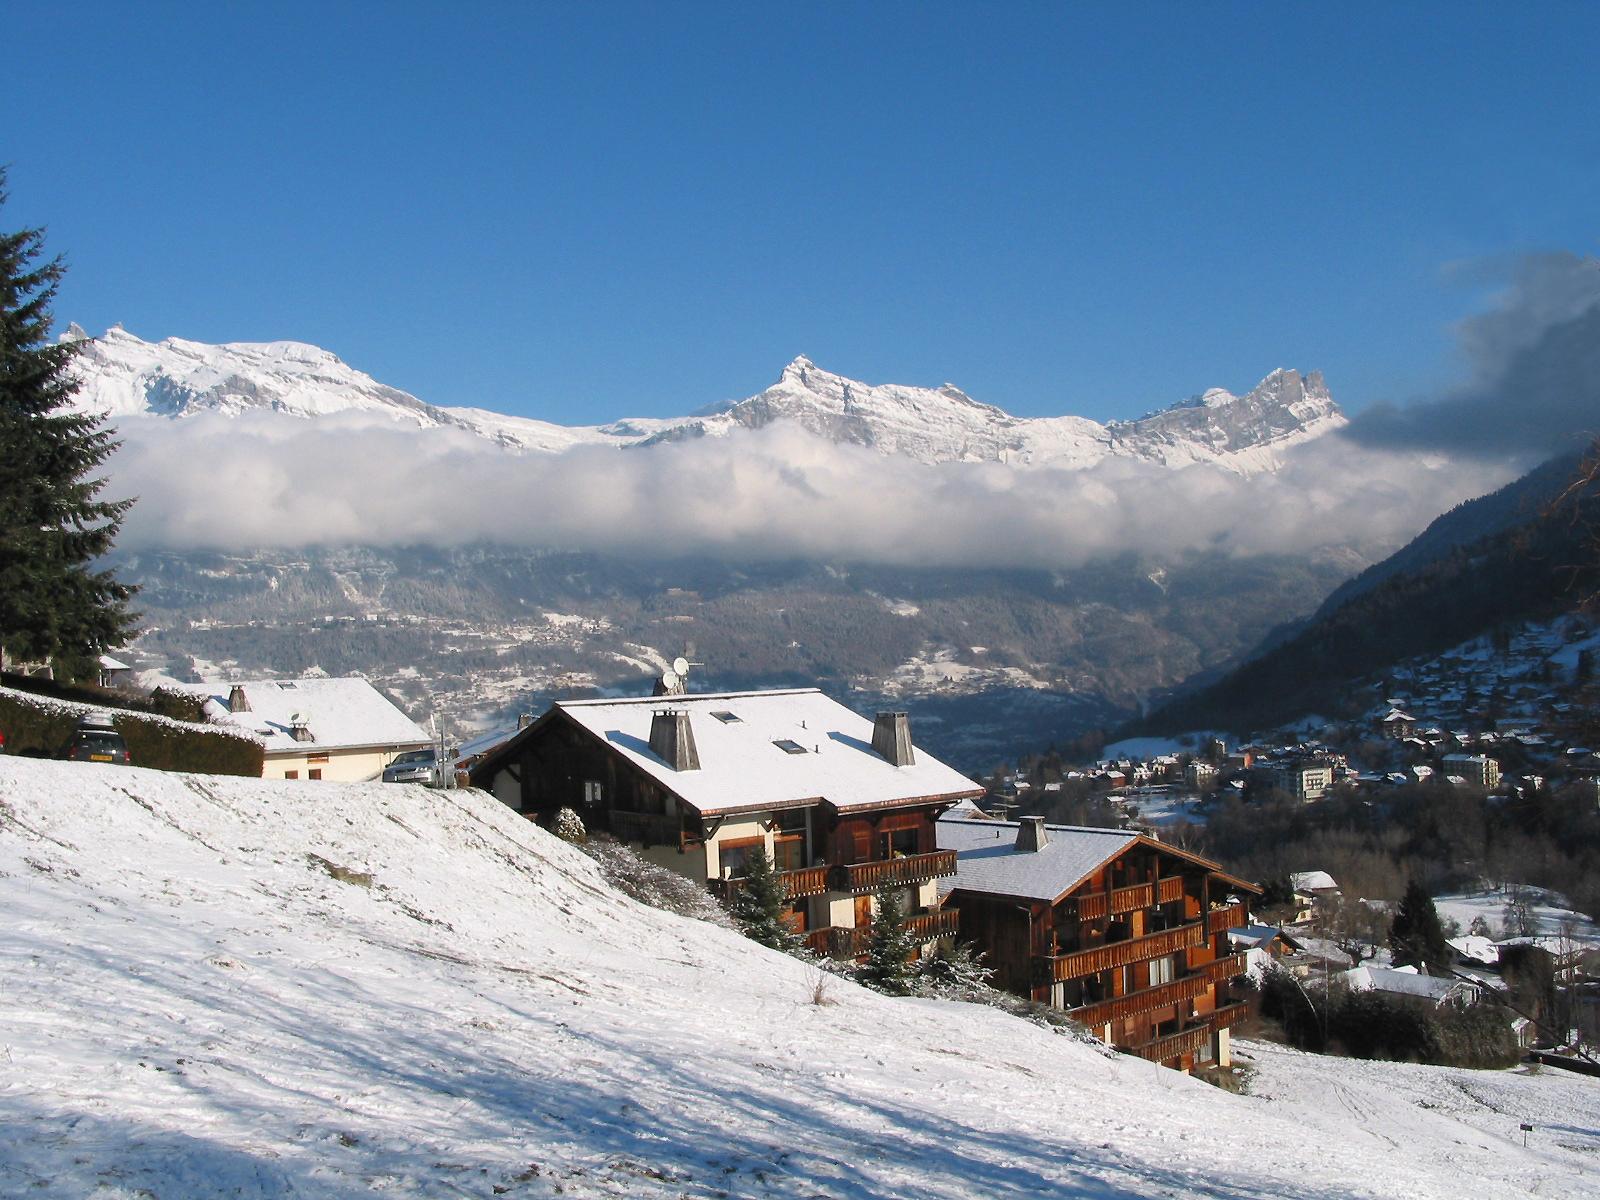 00 Saint Gervais les Bains JPG1 Wikipedia, the free ...